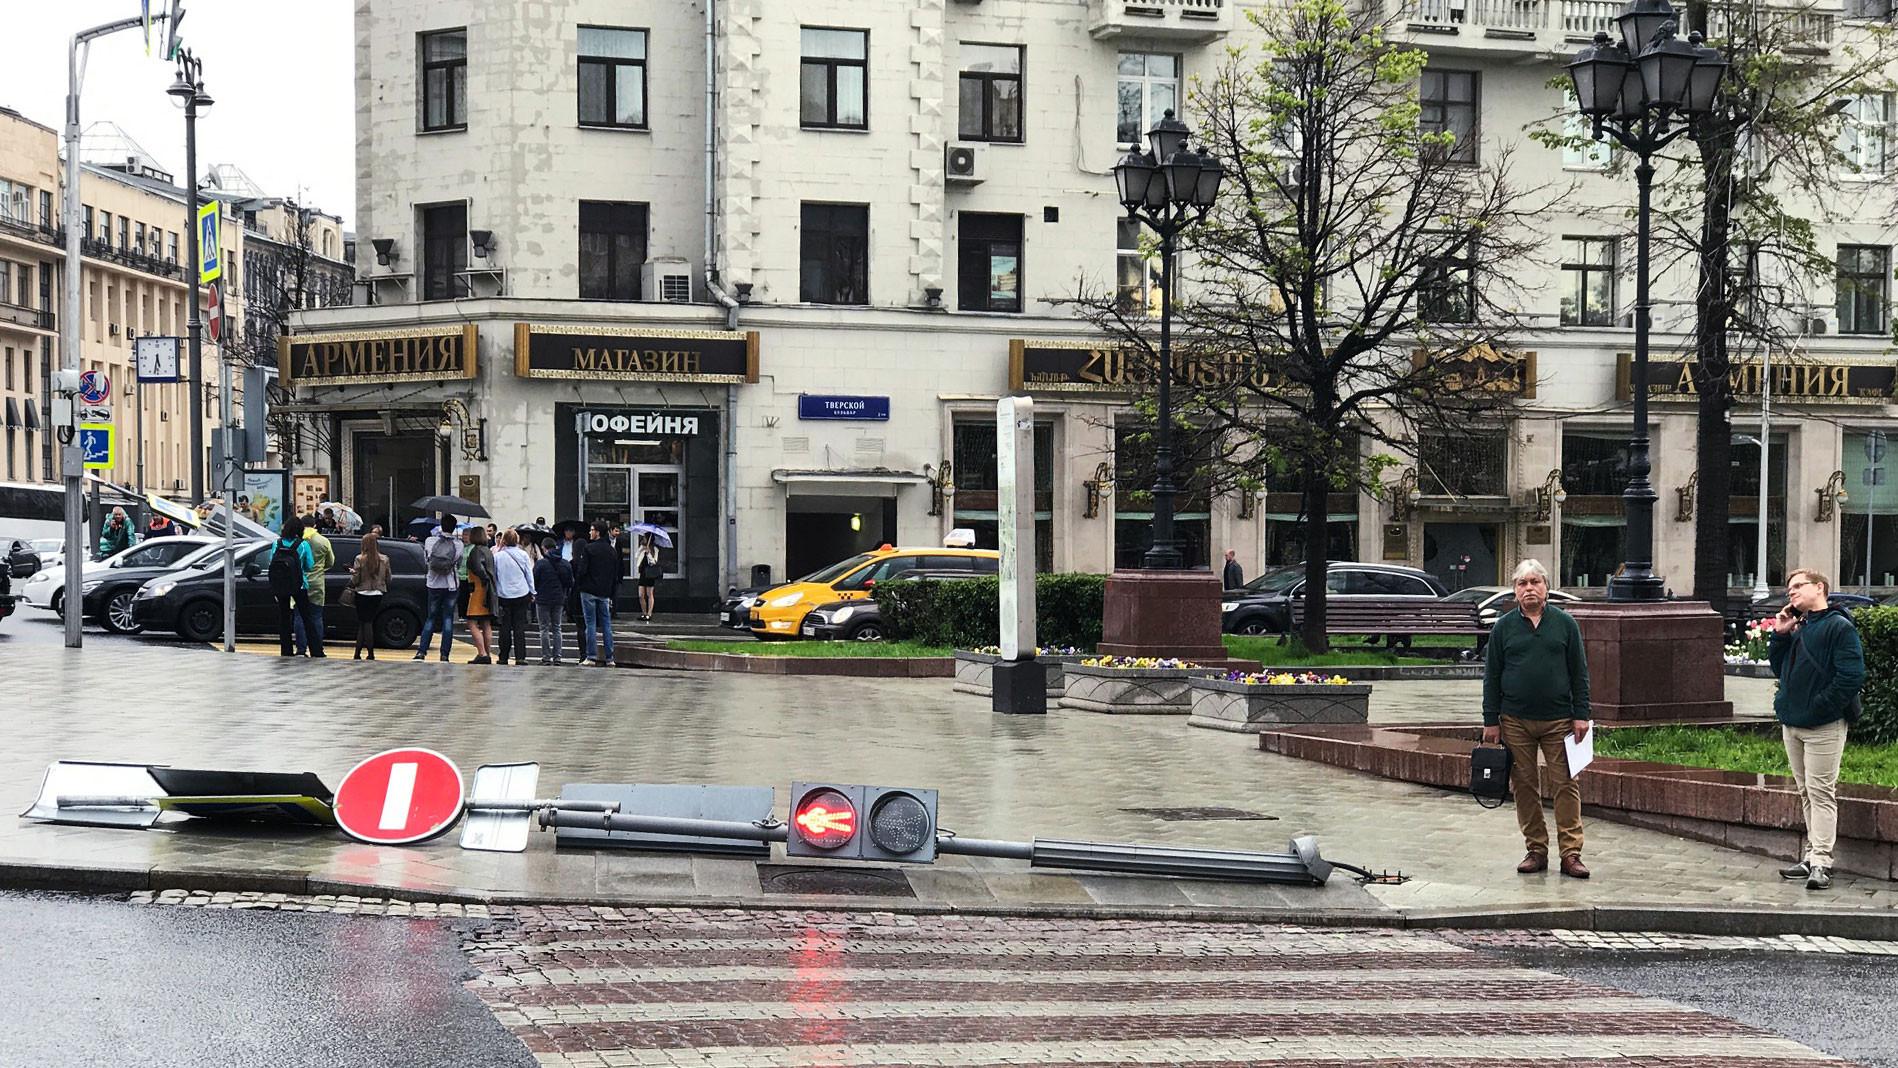 <p>Фото: &copy; РИА Новости /&nbsp;Геннадий Мельник</p>